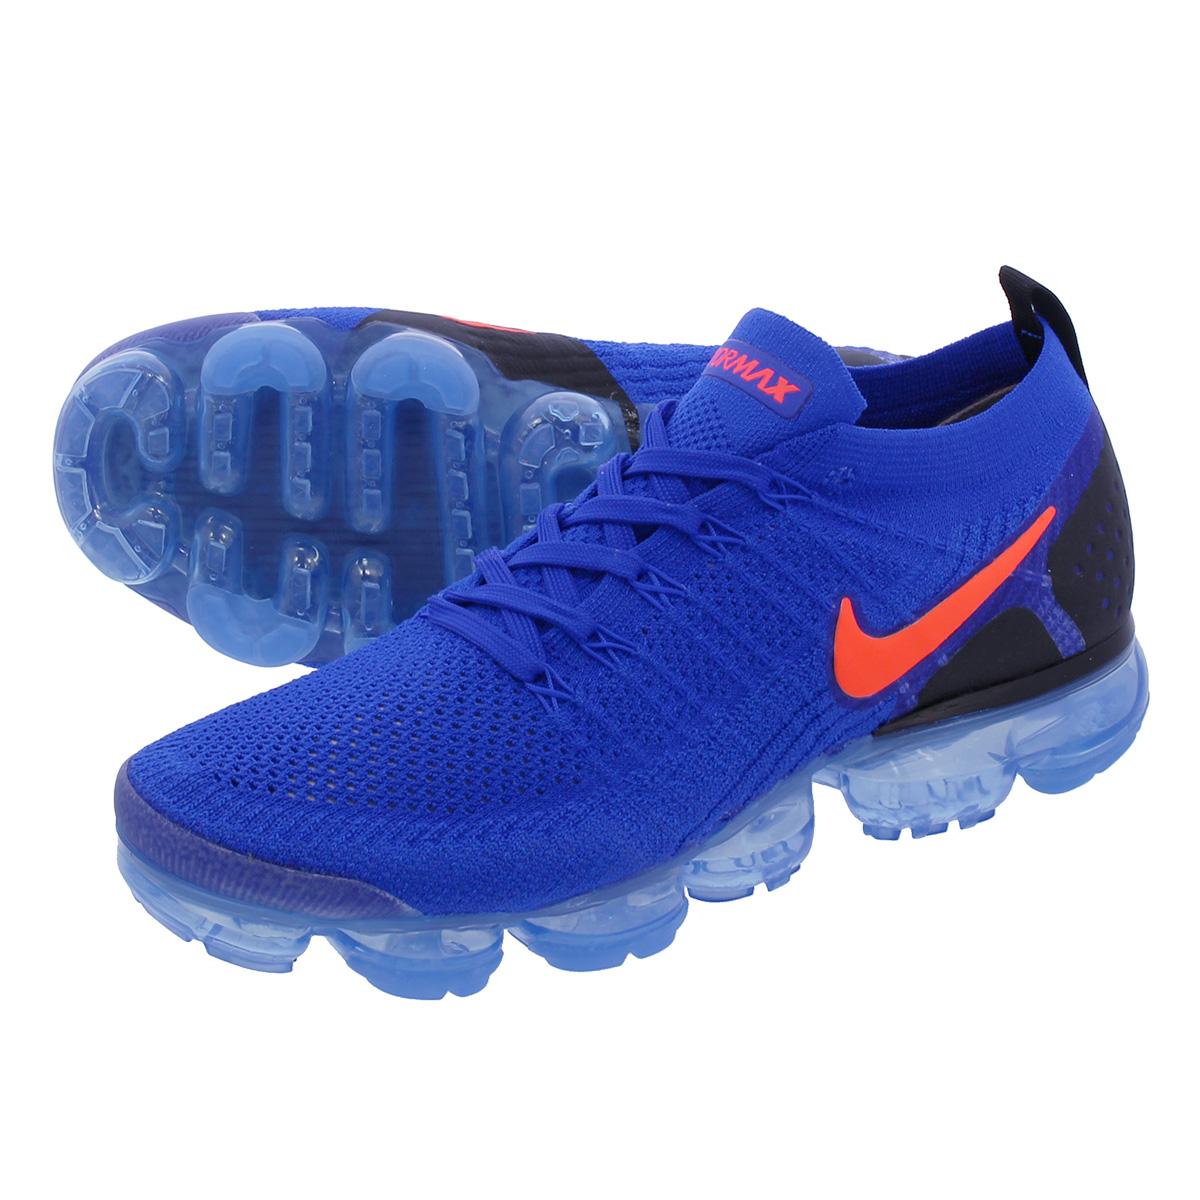 brand new f5246 500ee NIKE AIR VAPORMAX FLYKNIT 2 Nike vapor max fried food knit 2 RACER BLUE TOTAL  CRIMSON BLACK 942,842-400